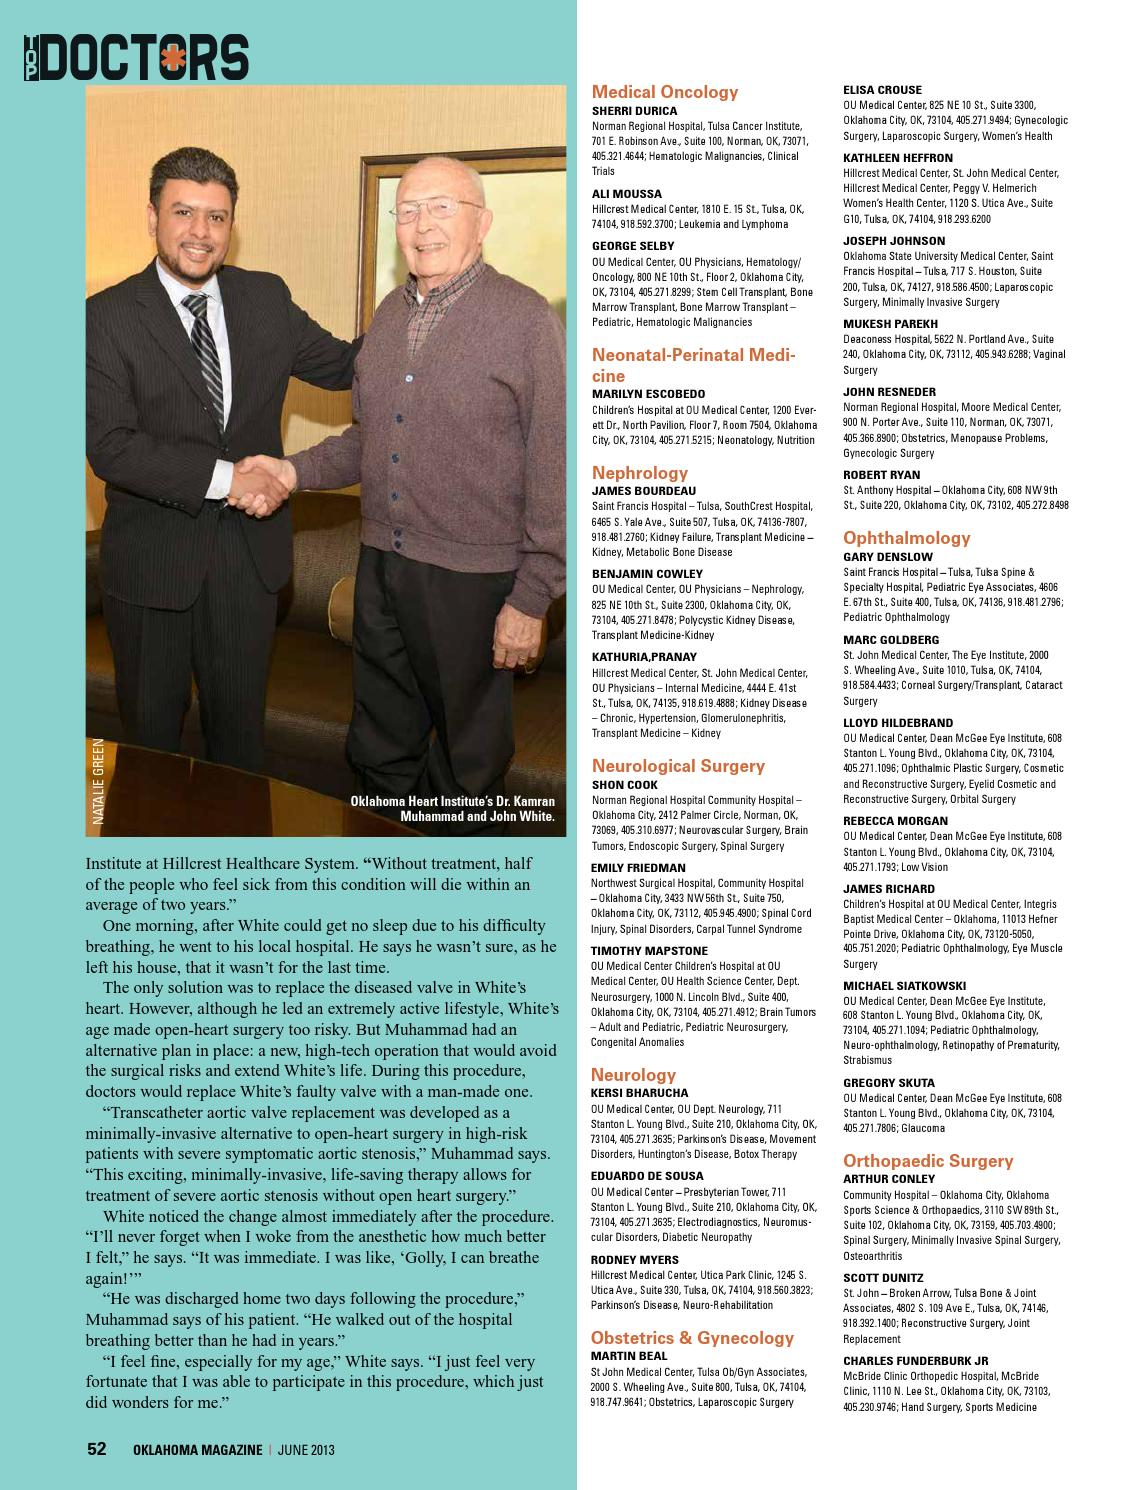 2013 June Oklahoma Magazine by Oklahoma Magazine - issuu